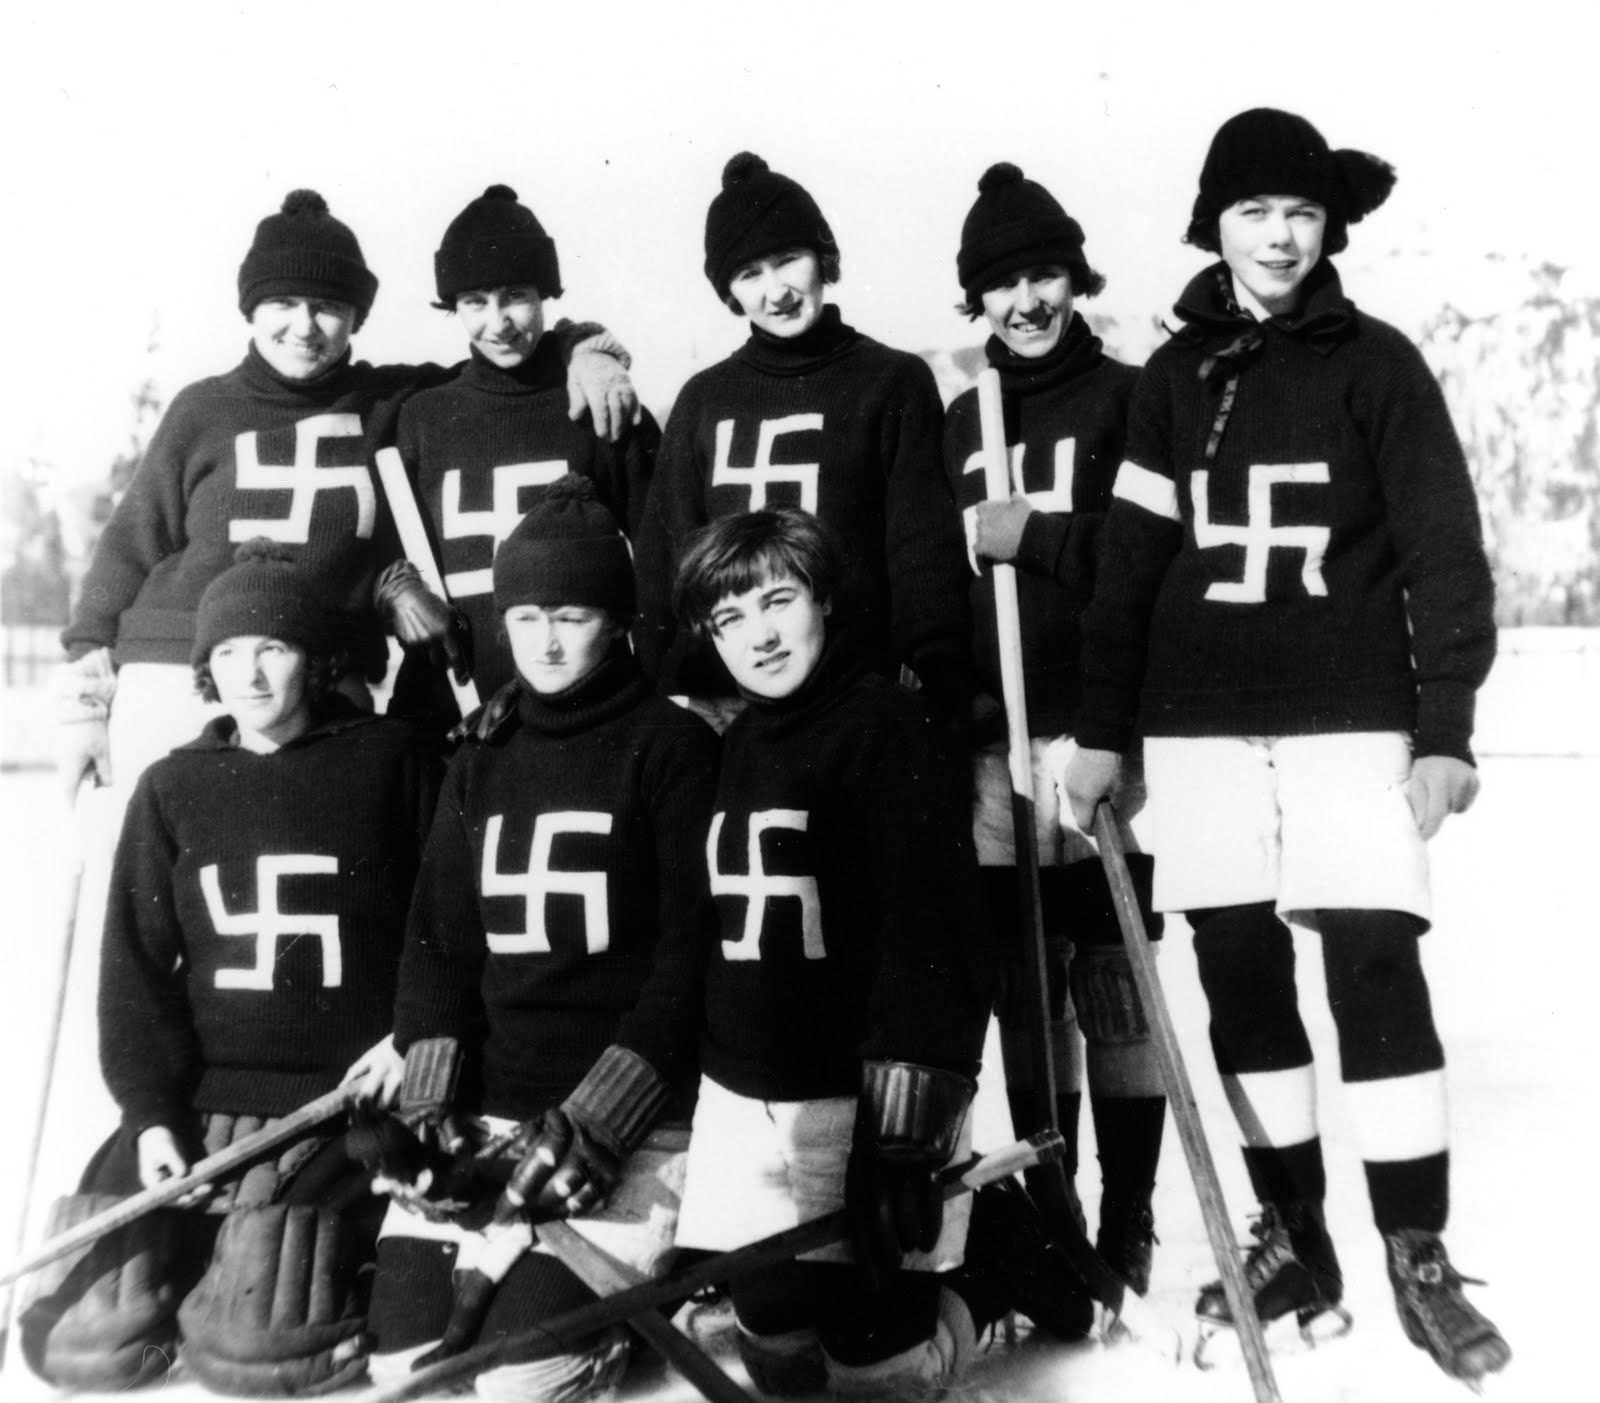 Fernie swastikas womens hockey team 1922 before wwii the swastika fernie swastikas womens hockey team 1922 before wwii the swastika was a common religious symbol biocorpaavc Gallery